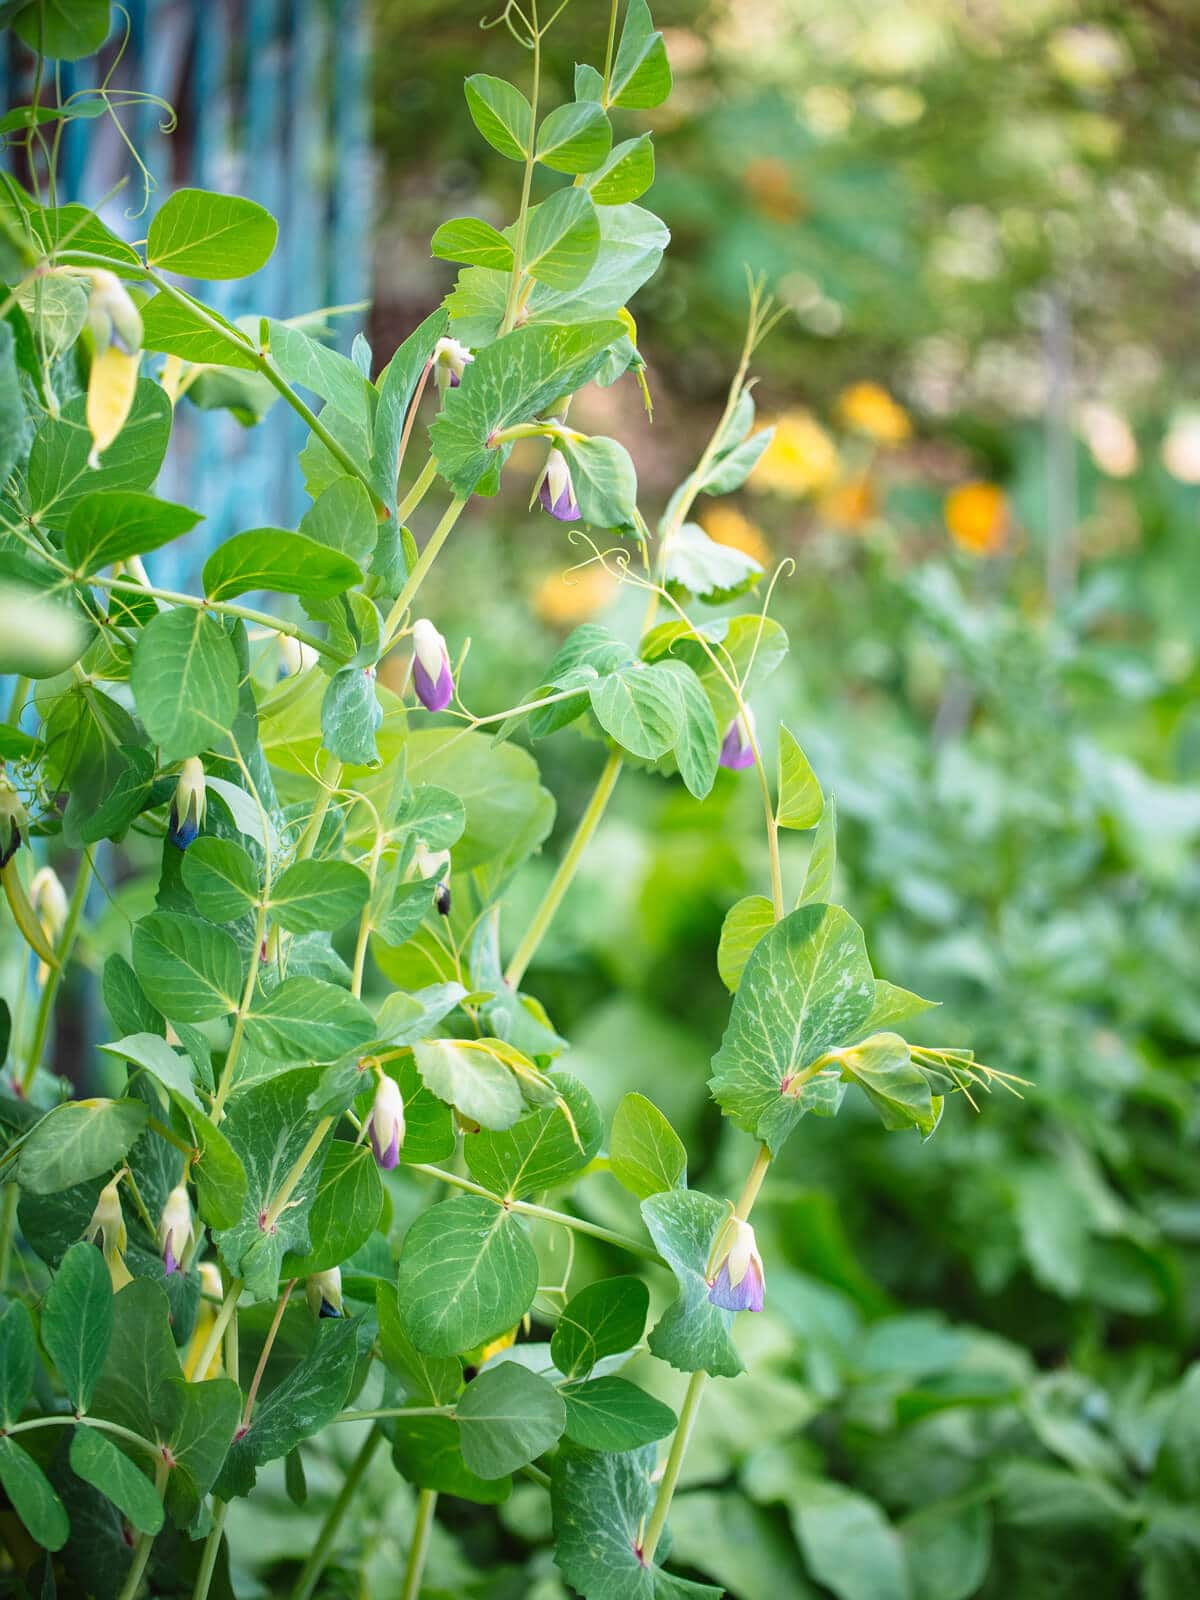 Snow pea plants climbing on a trellis